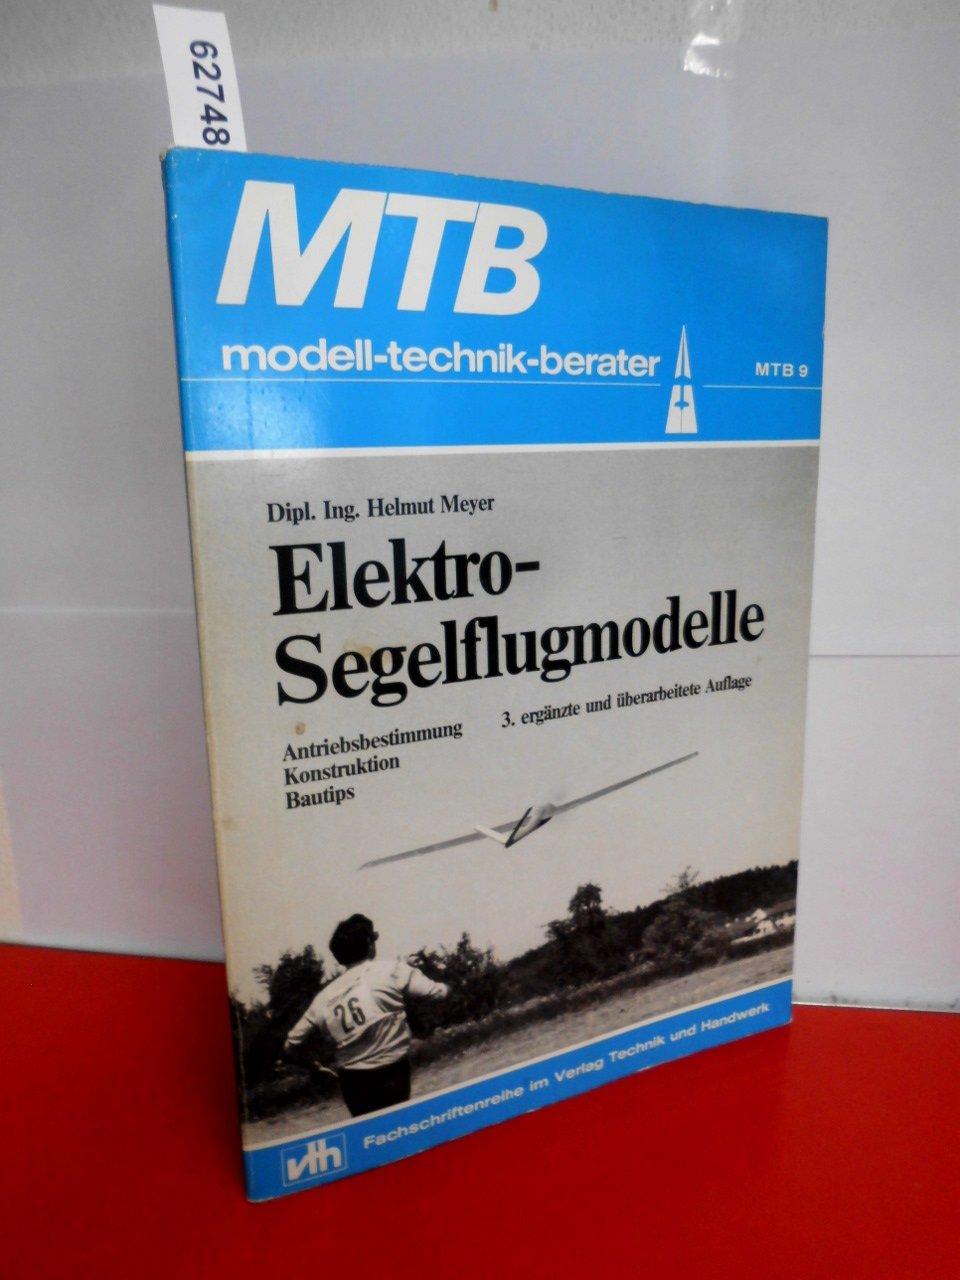 Elektro-Segelflugmodelle. Antriebsbestimmung Konstruktion Bautips